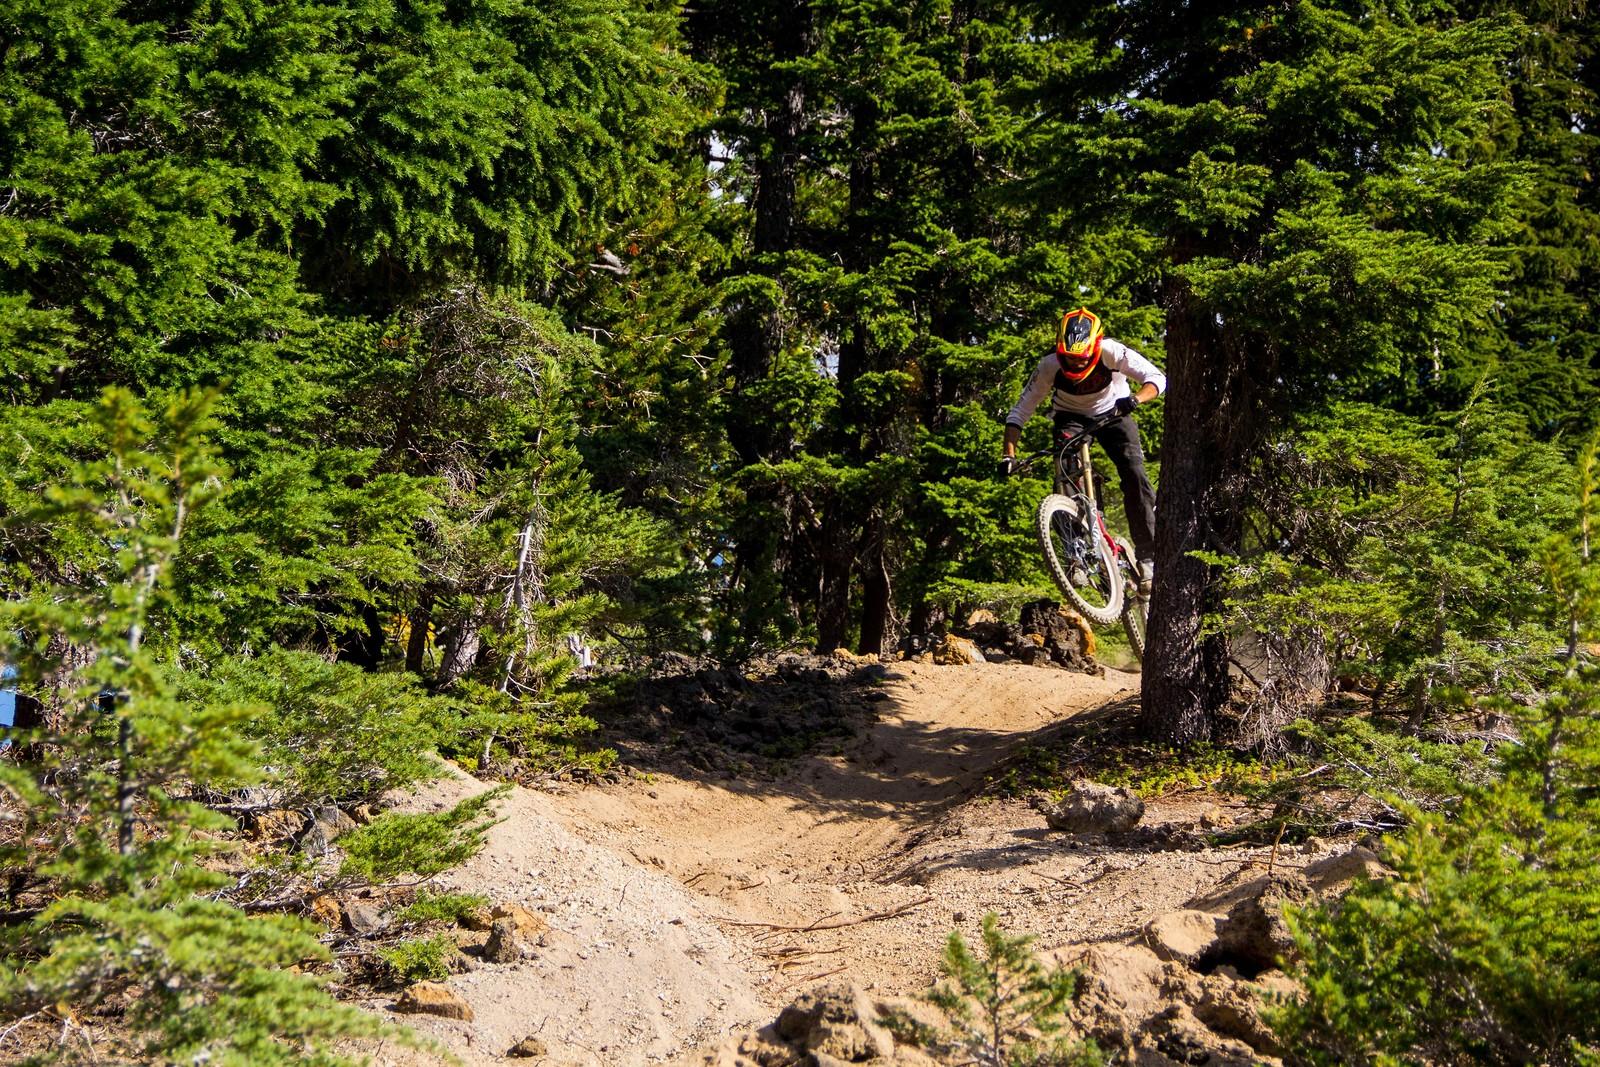 Bache-3 - Yuroshek - Mountain Biking Pictures - Vital MTB